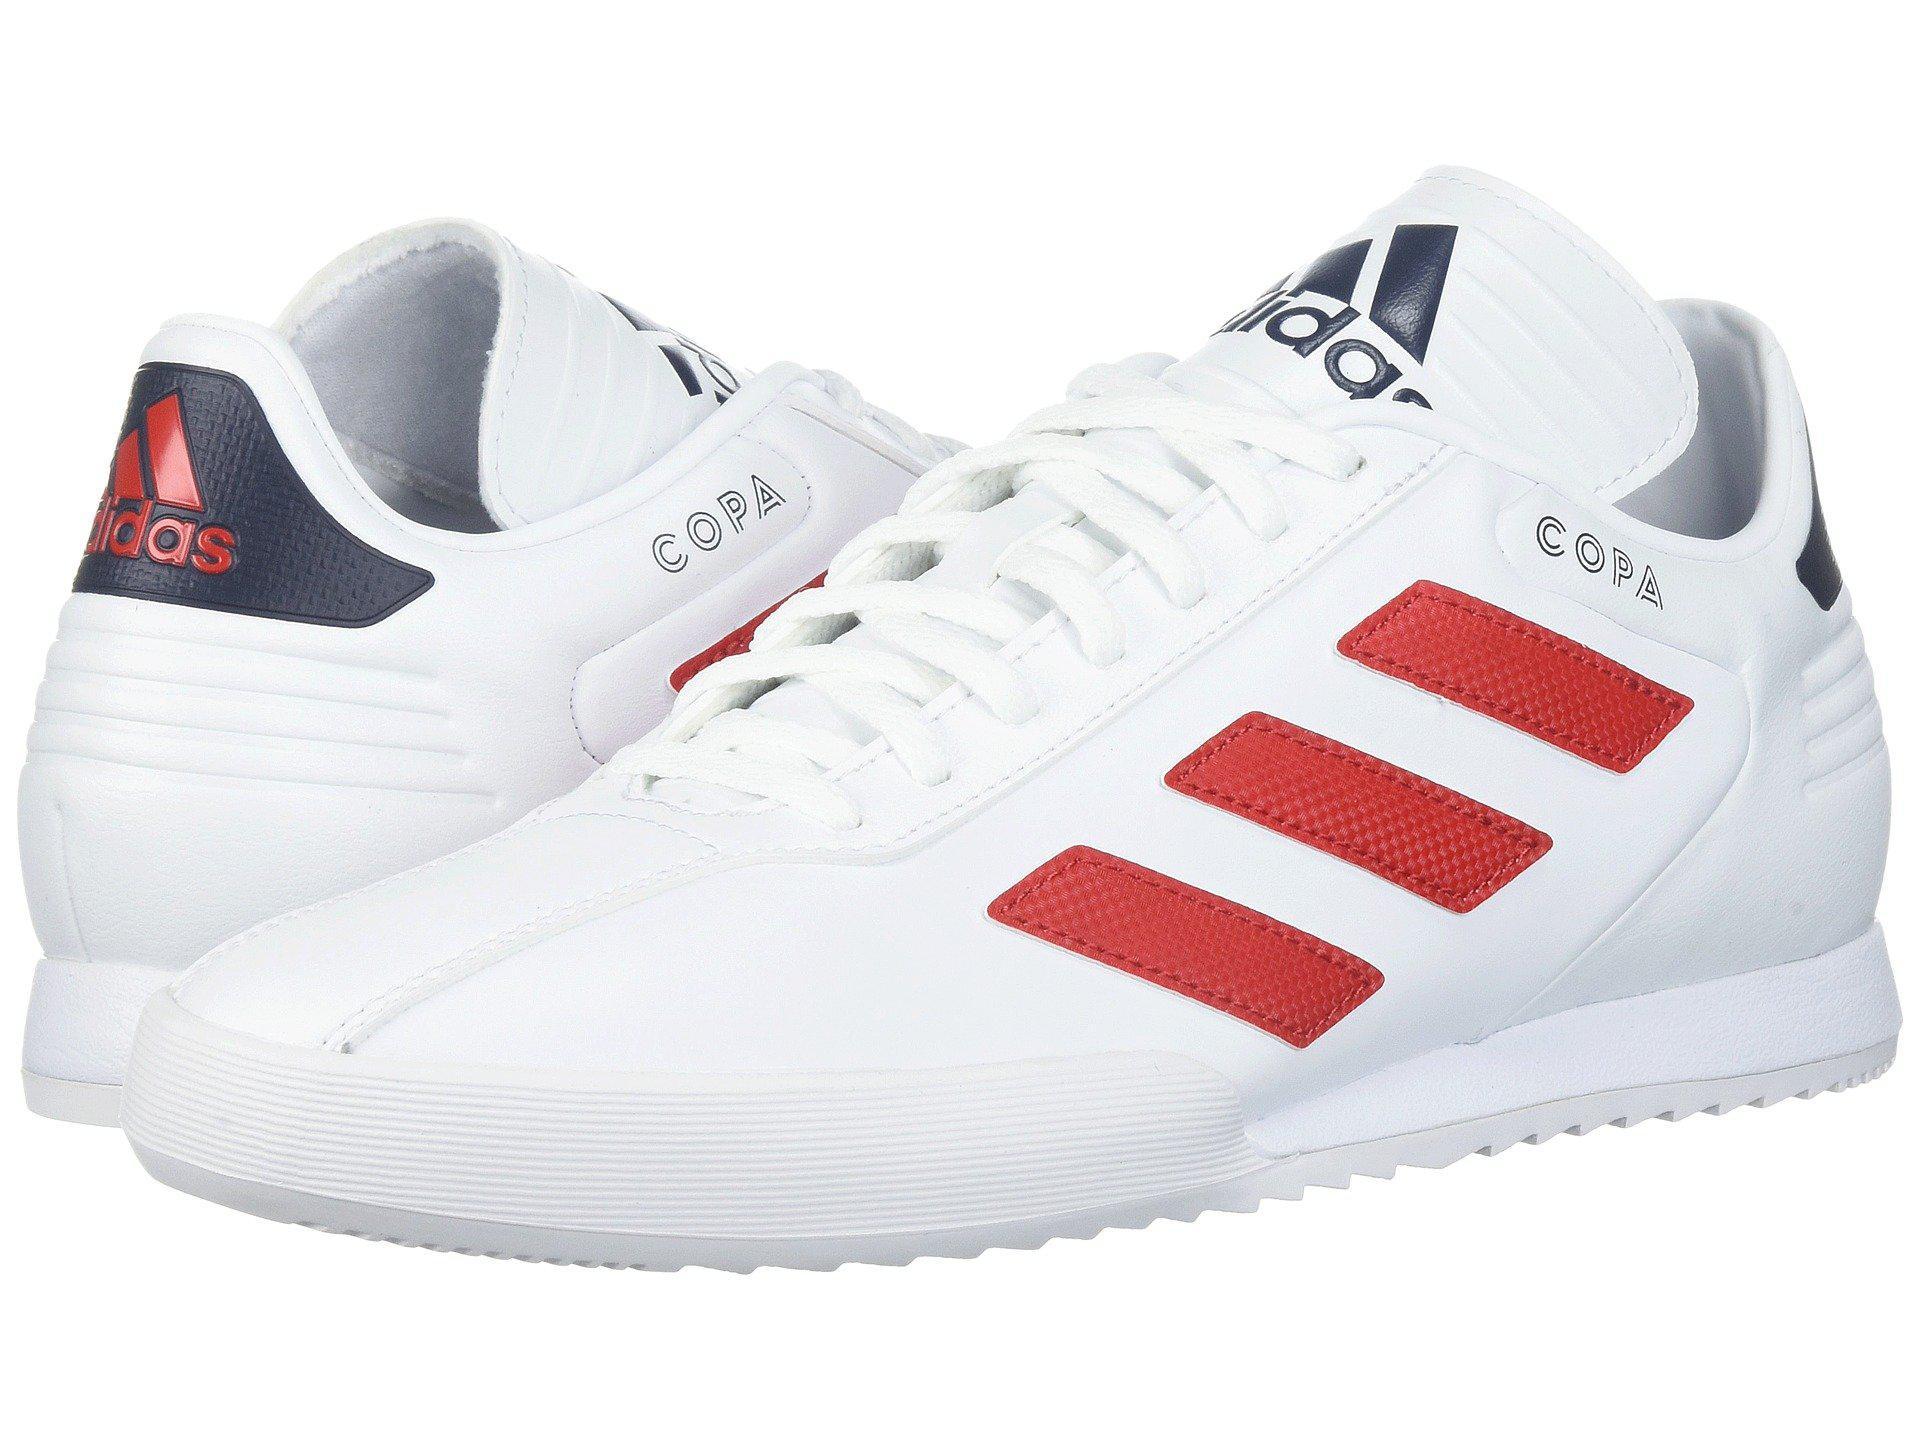 Adidascopa Super - Pack Pays De Gros Livraison Gratuite Eastbay kbTU1SMYlc